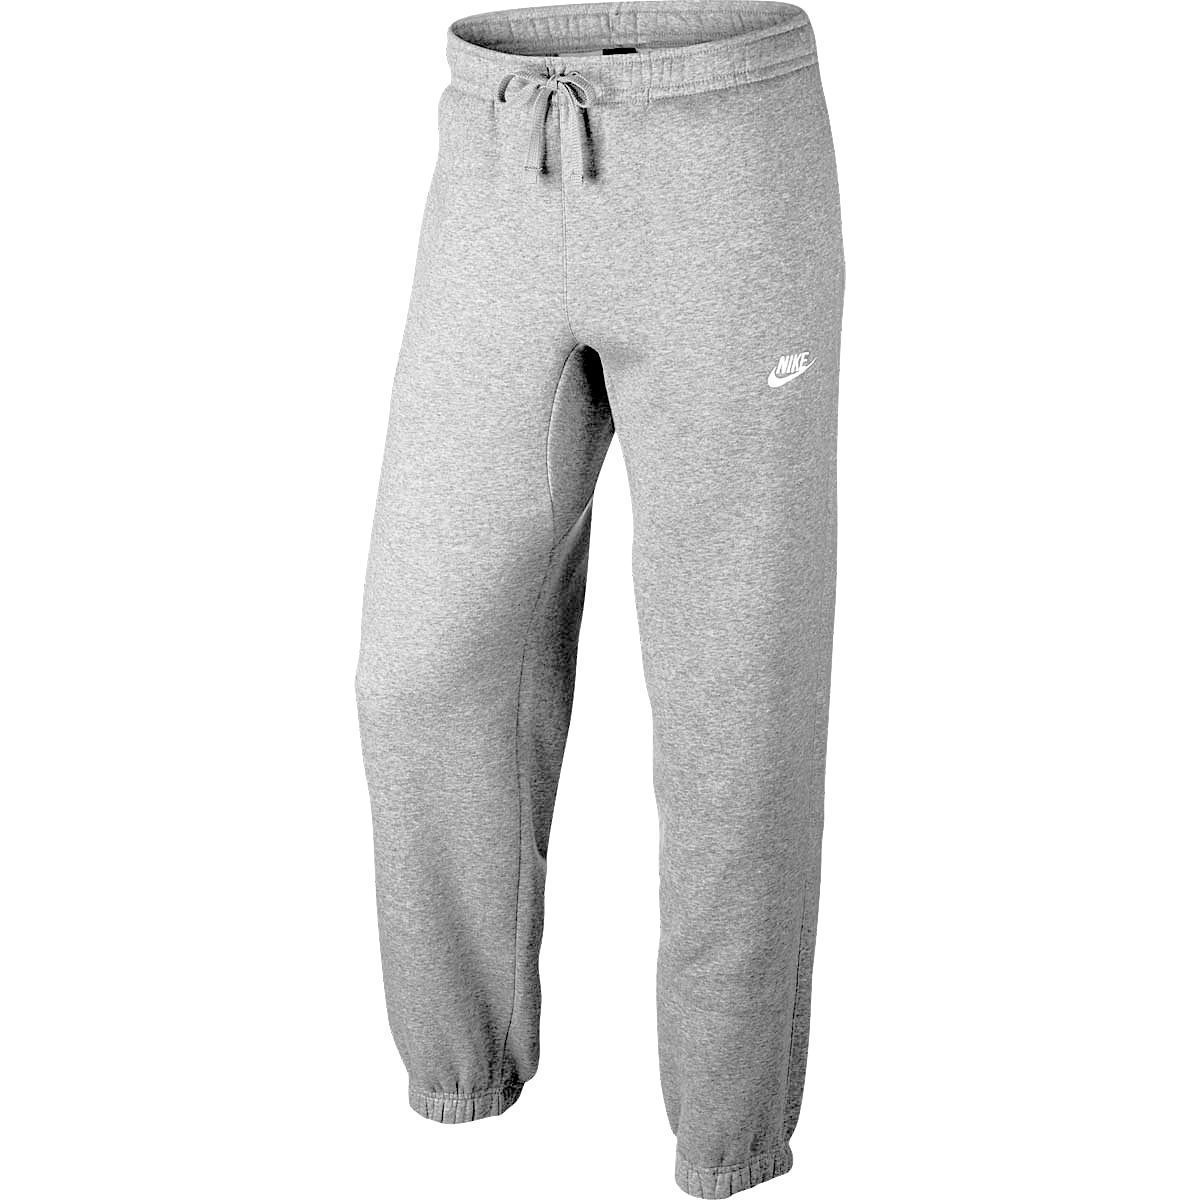 Nike Club Fleece Cuffed Men's Bottom Pants GreyWhite 804406